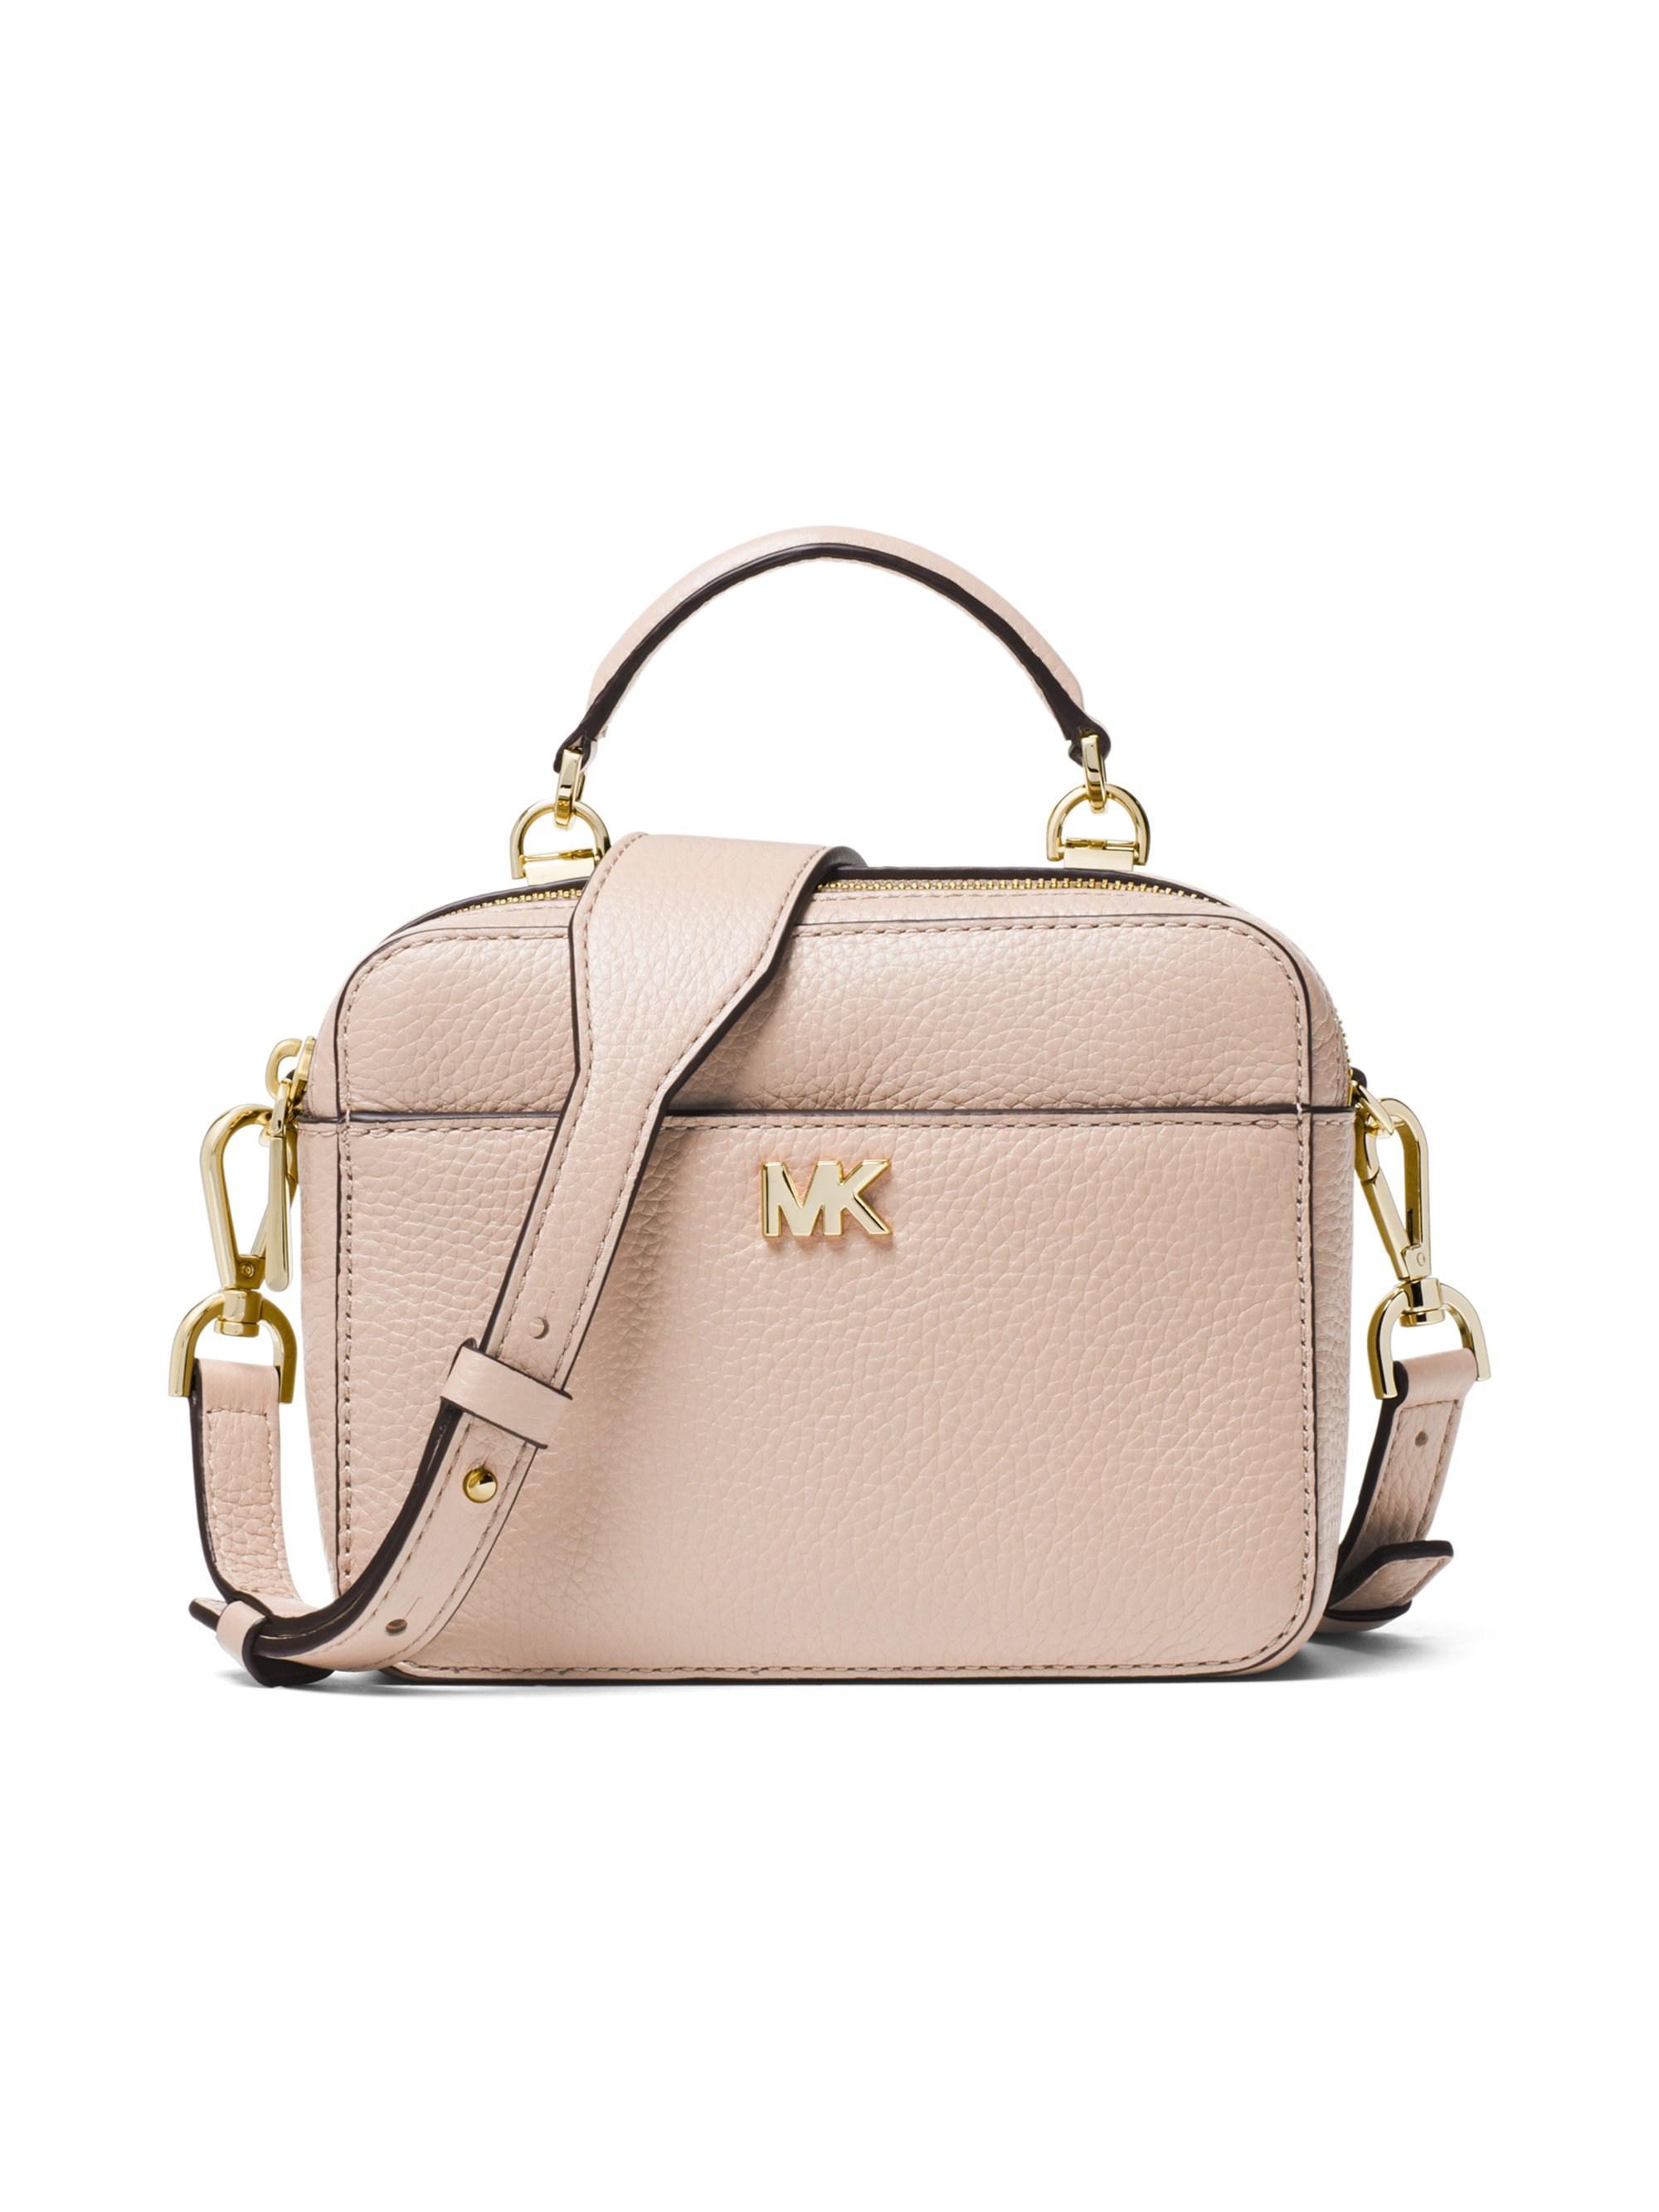 a0857b4a72f8 Lyst - MICHAEL Michael Kors Women s Mott Mini Pebbled Leather ...